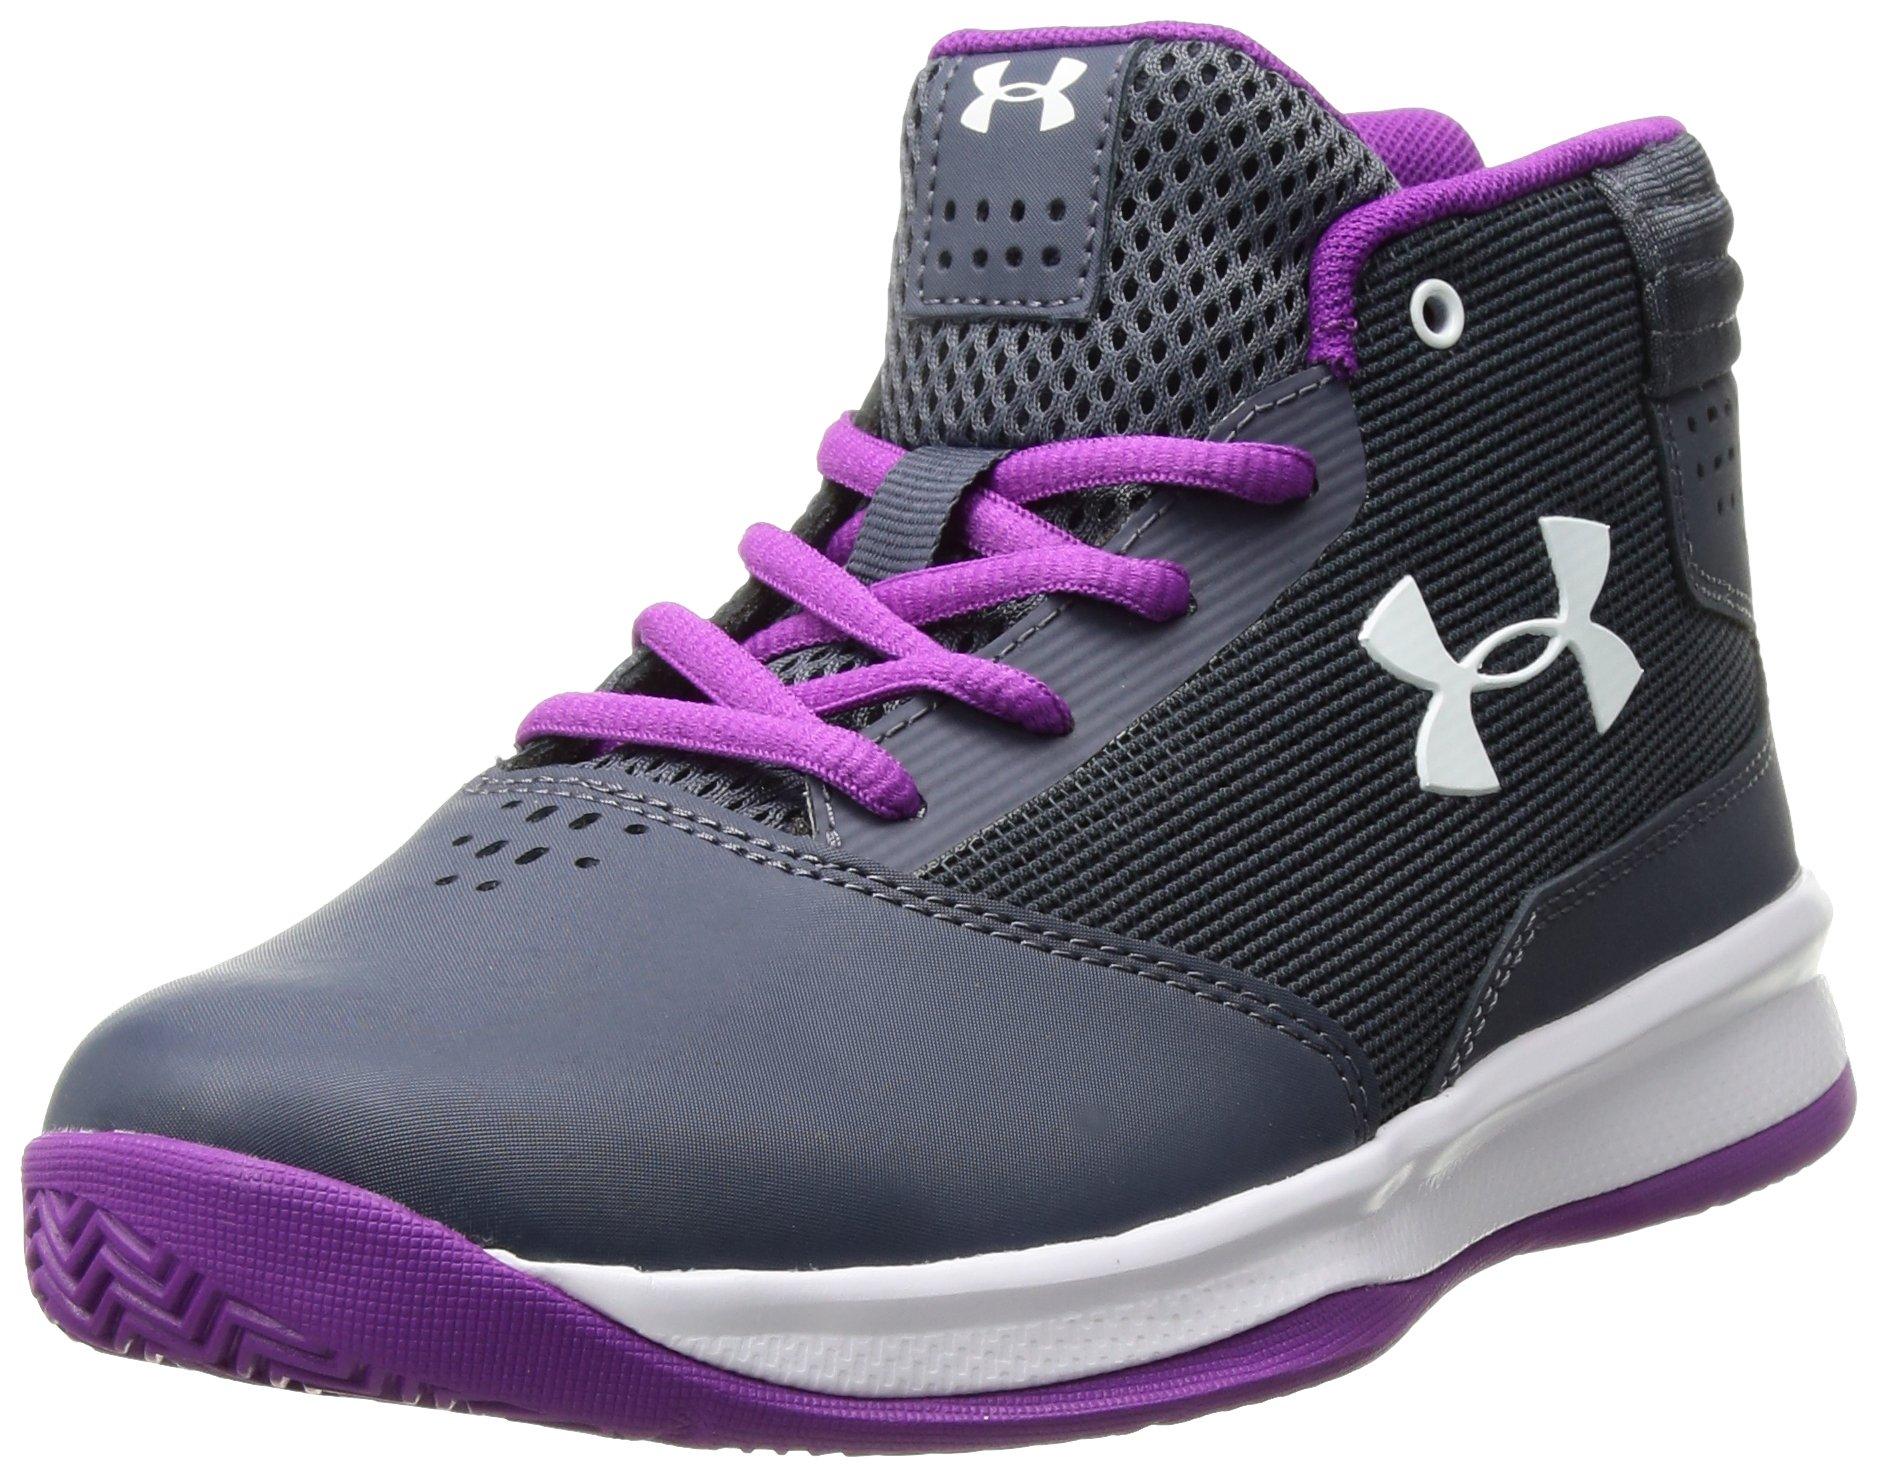 Under Armour Girls' Pre School Jet 2017 Basketball Shoe, Apollo Gray (962)/White, 1.5